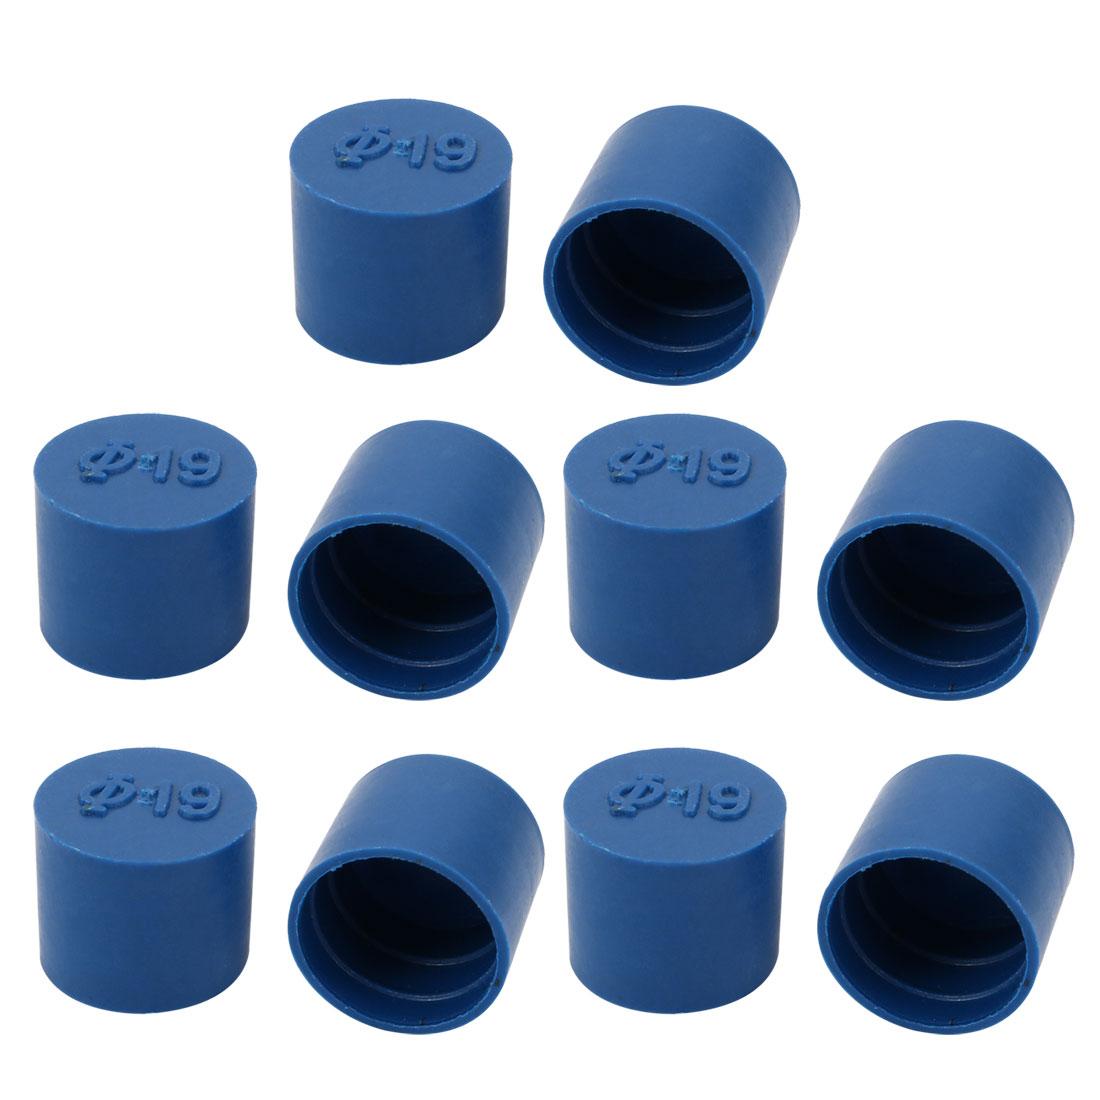 10pcs 19mm Inner Dia PE Plastic End Cap Bolt Thread Protector Tube Cover Blue